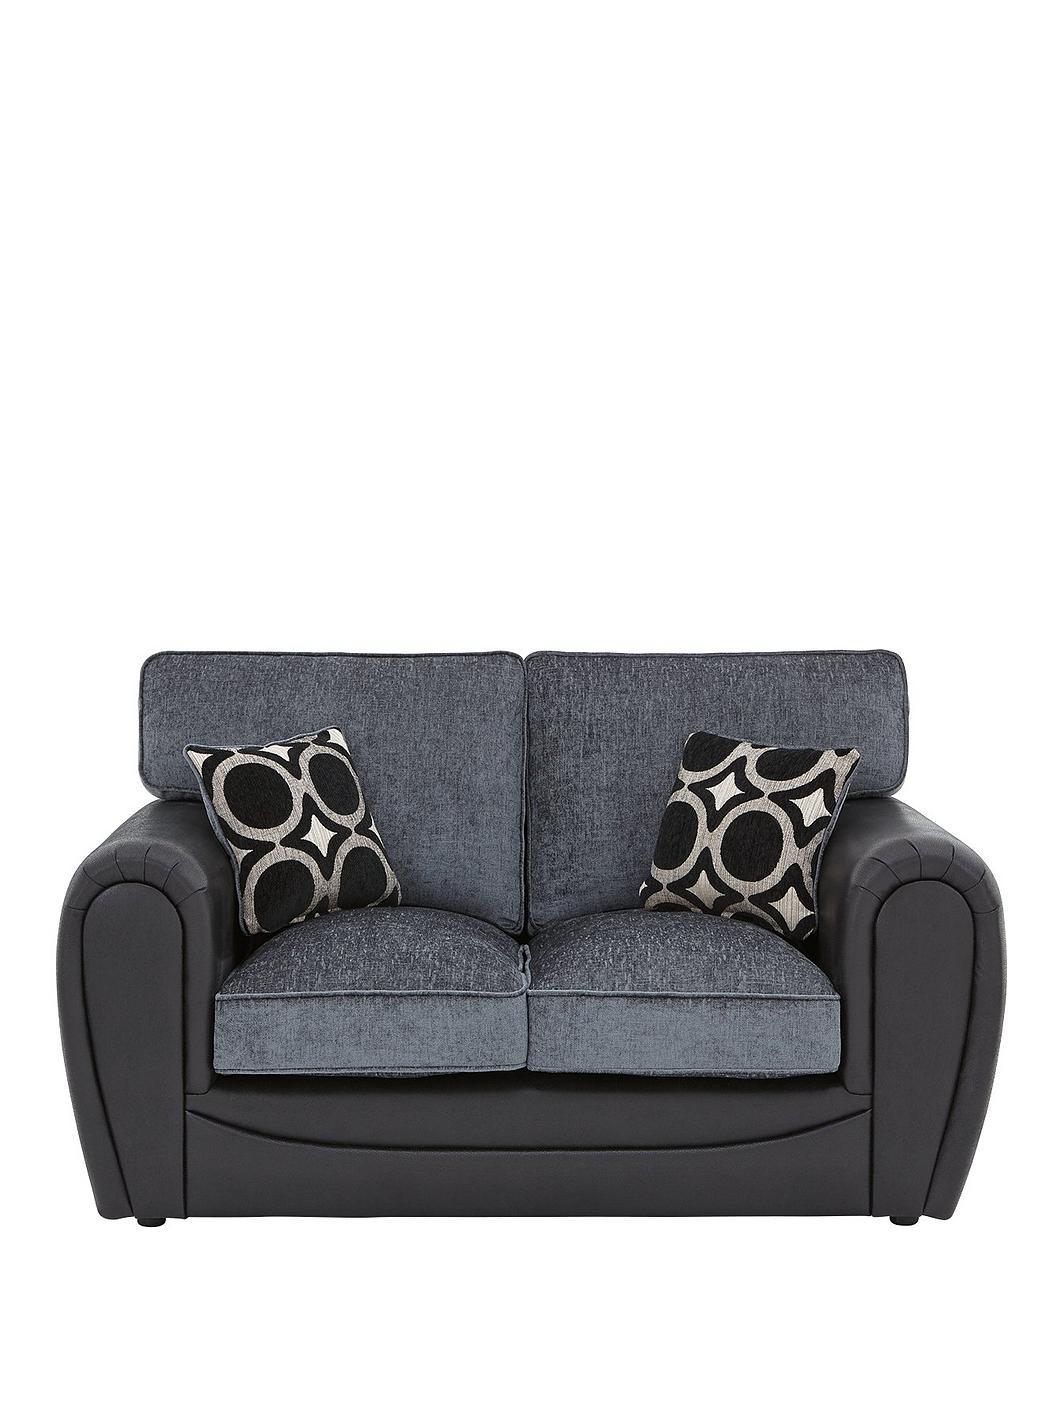 bardot 2 seater standard sofa